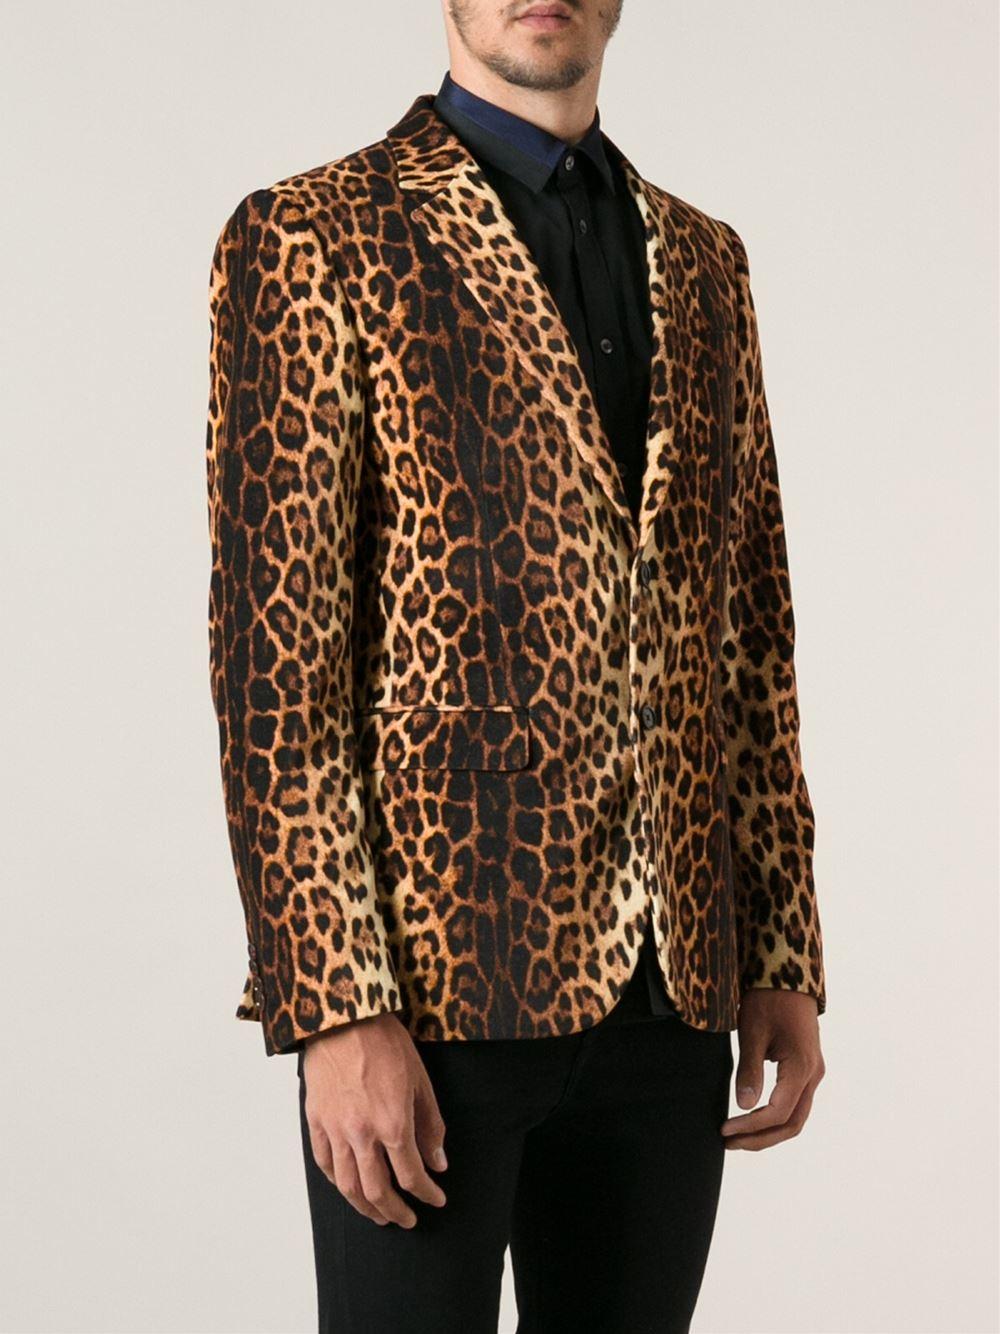 3cd4cd8dd6 Moschino Leopard Print Blazer for Men - Lyst